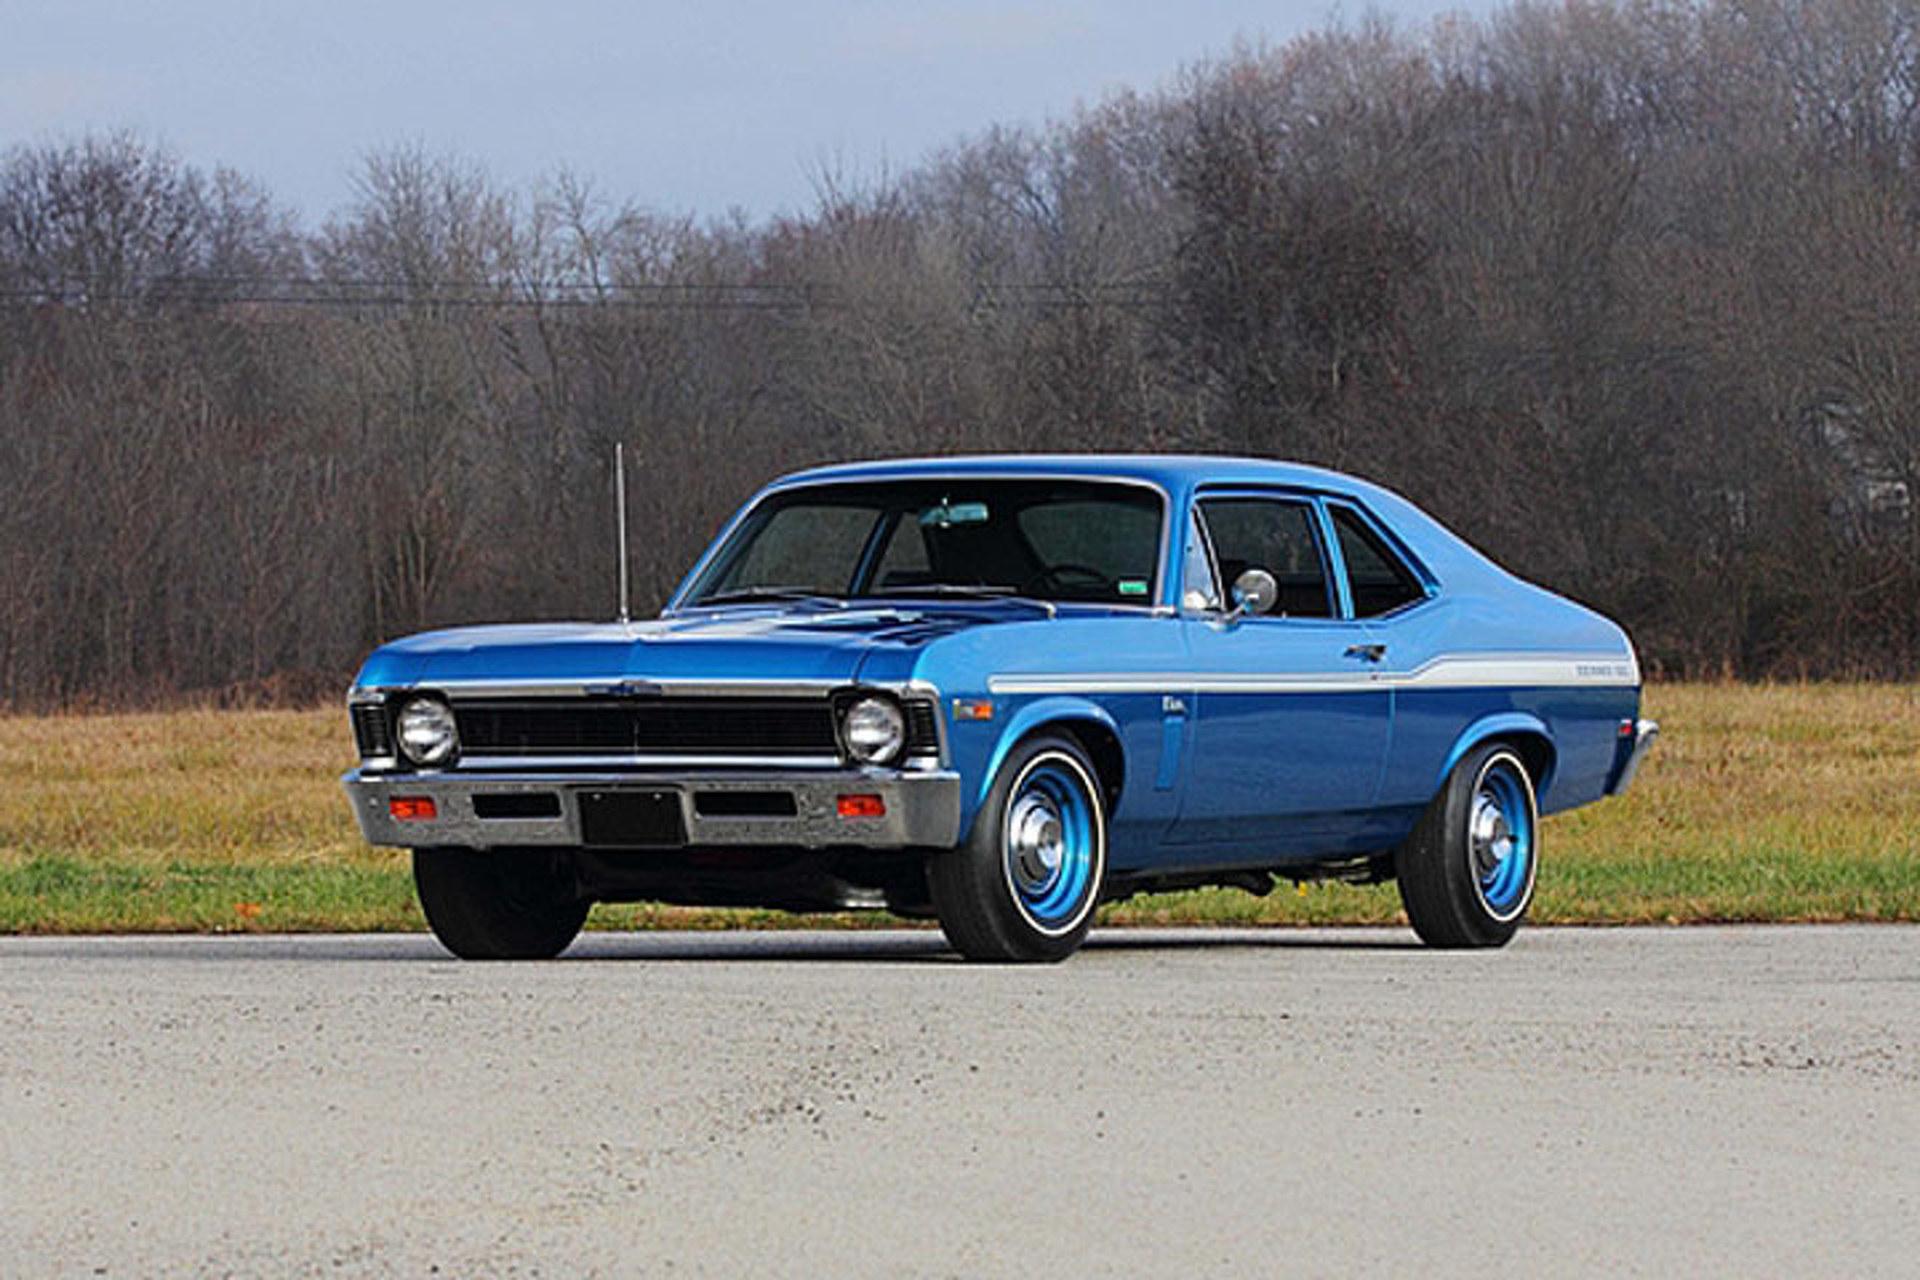 Budget-Built 1970 Chevy Nova Turns Into a Pro Touring Terror